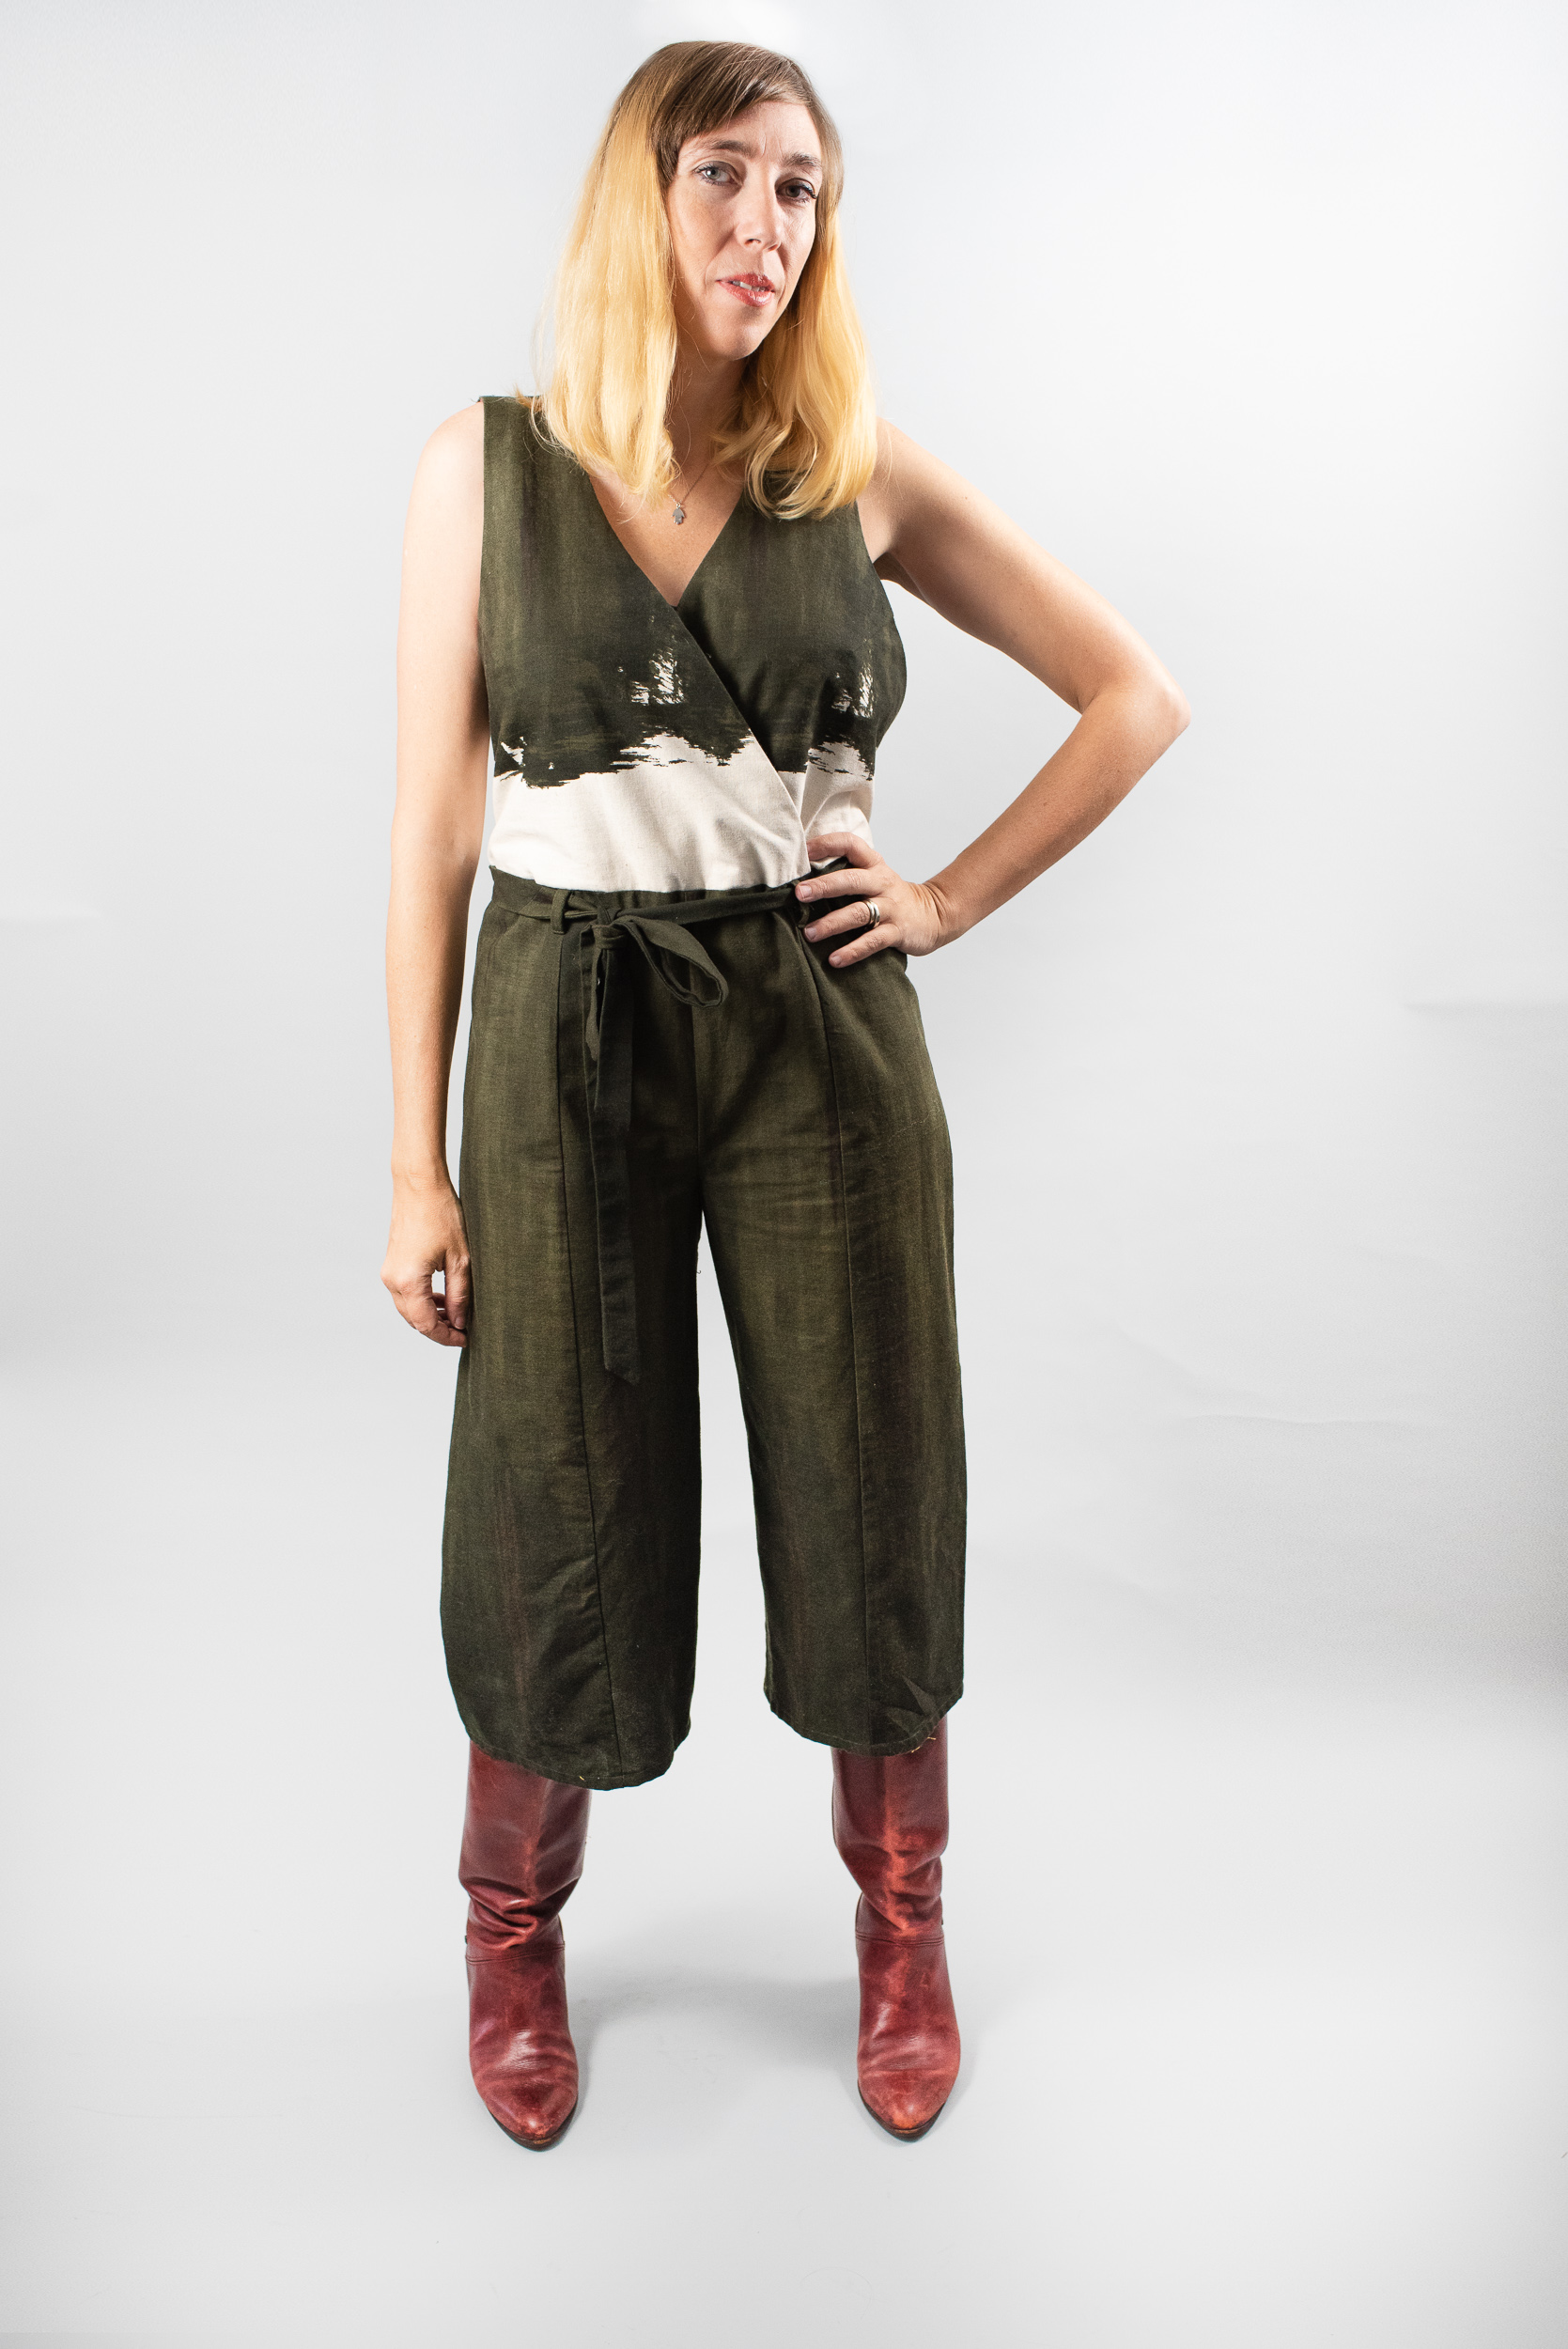 Parasol-wrap-jumpsuit-trousers-pdf-sewing-pattern01-4.jpg